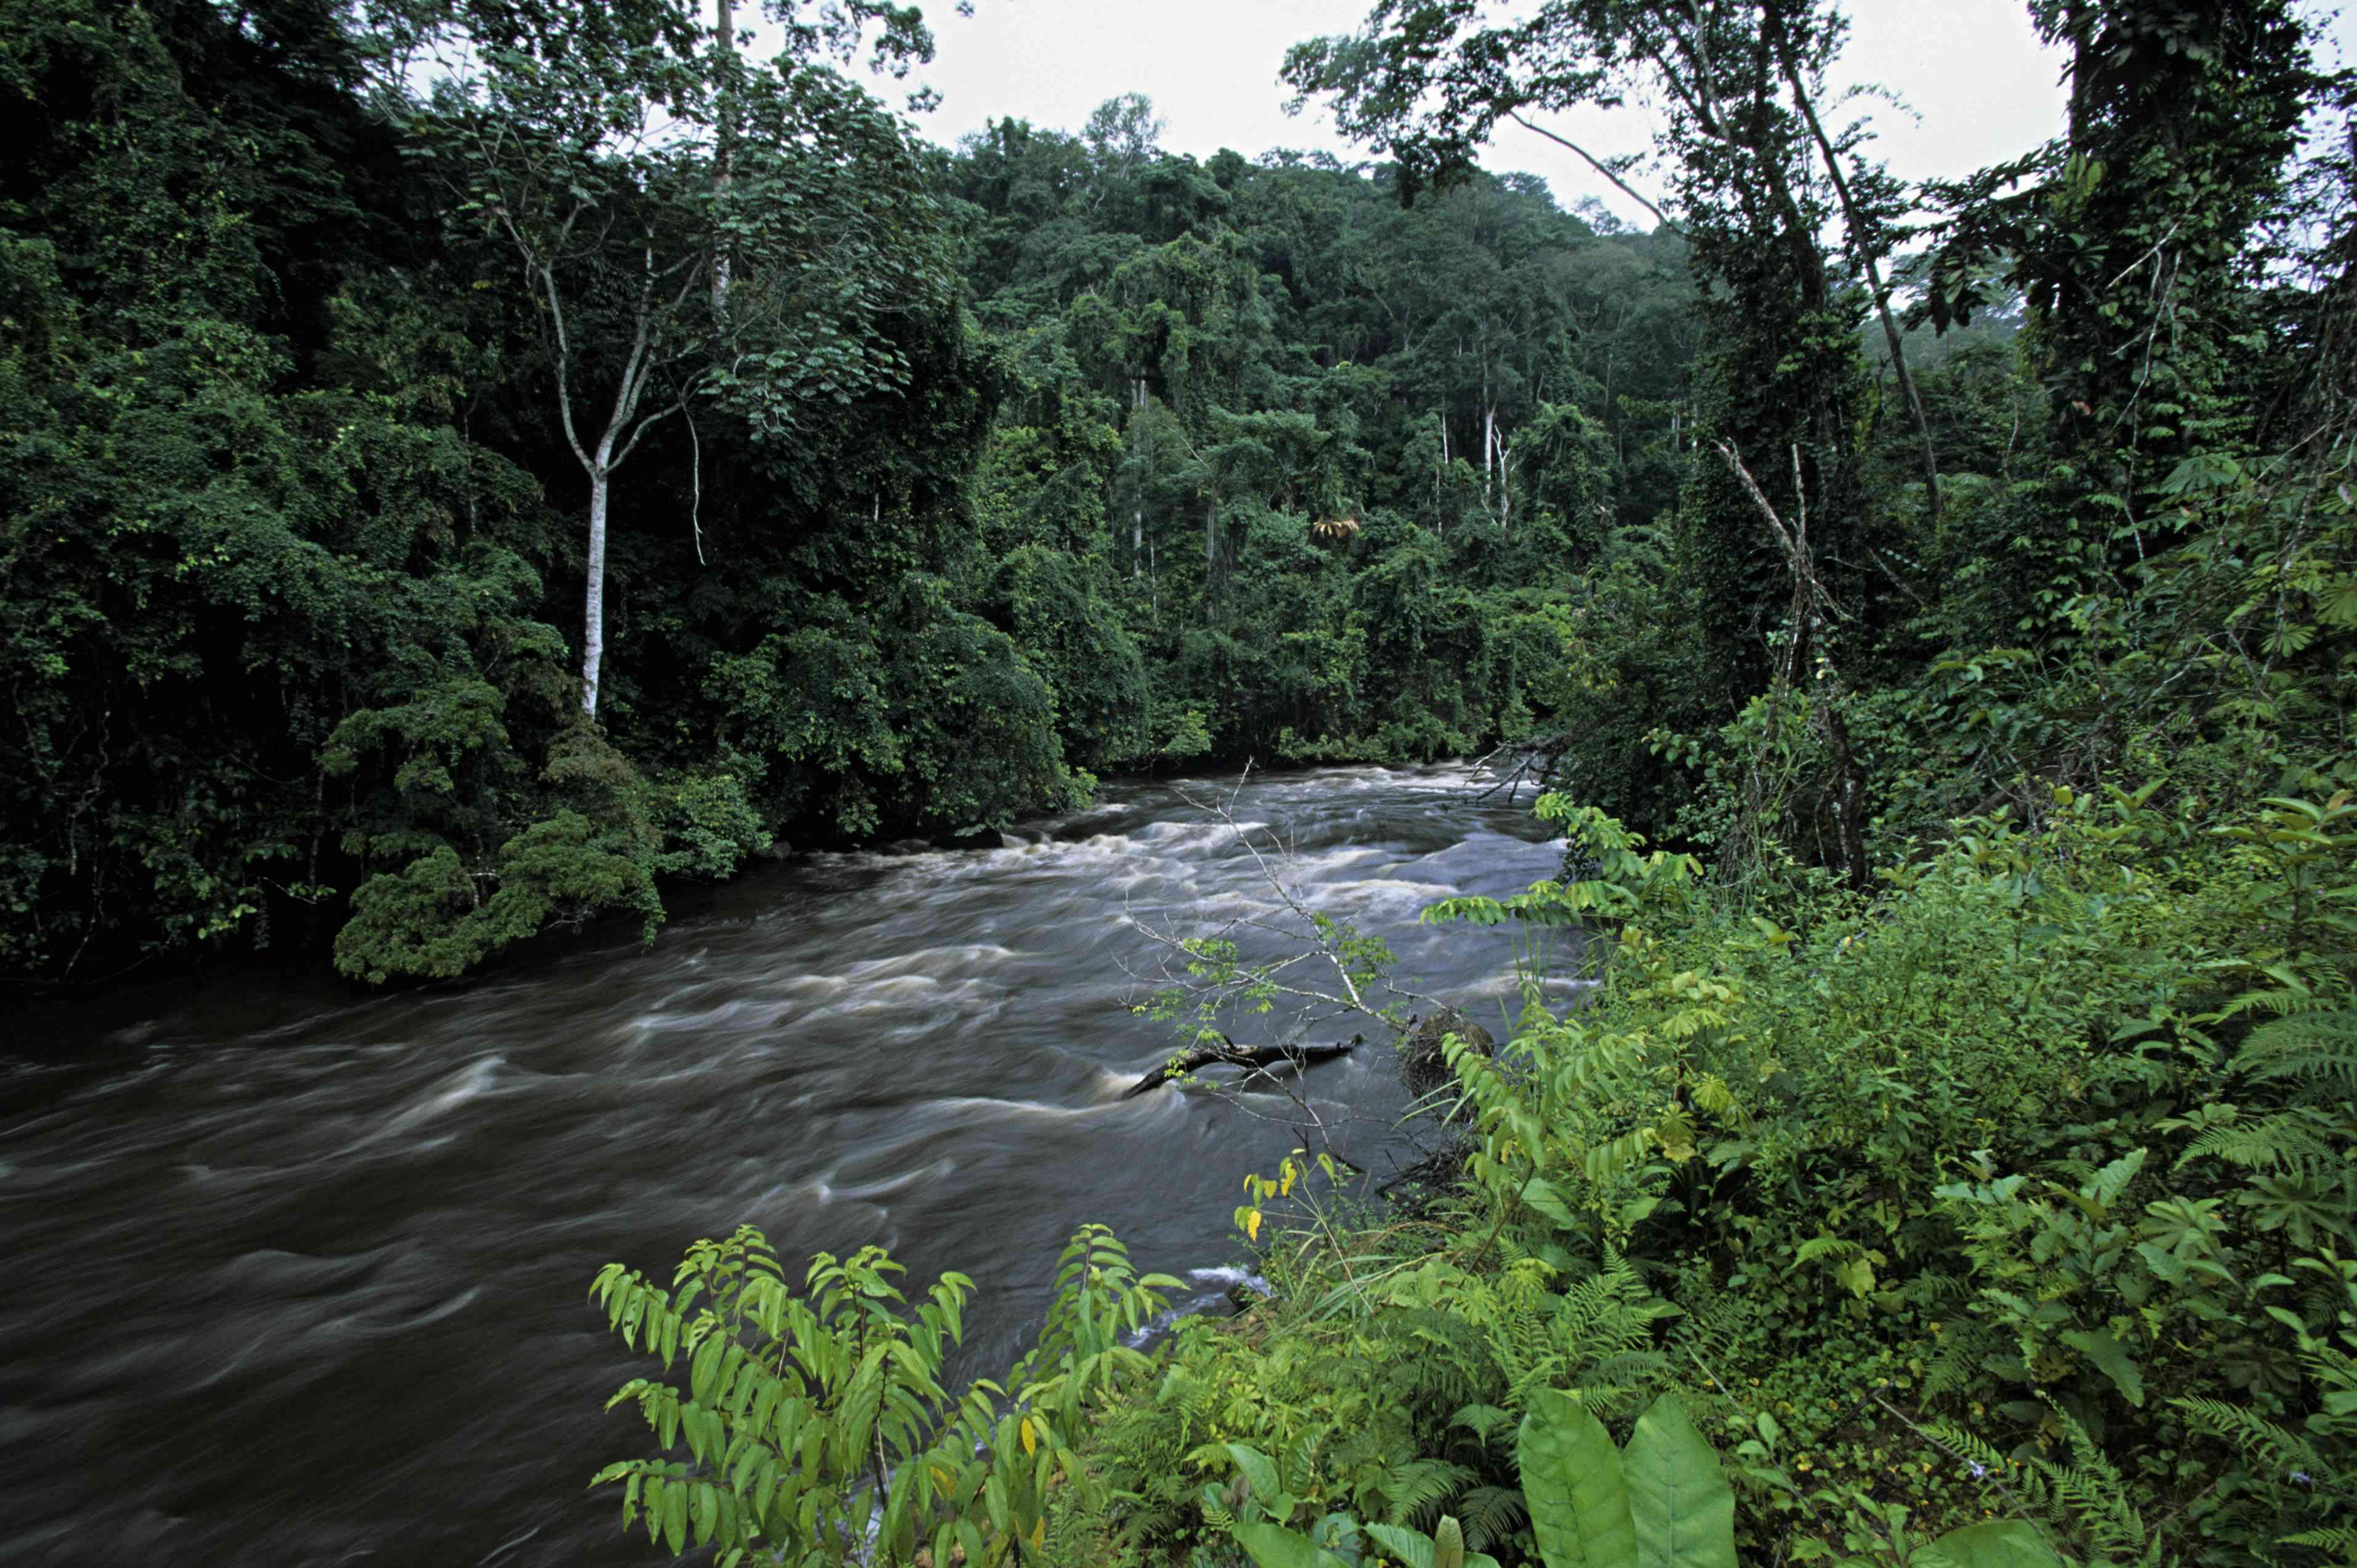 Tropical rainforest surrounding river in Gabon, Africa